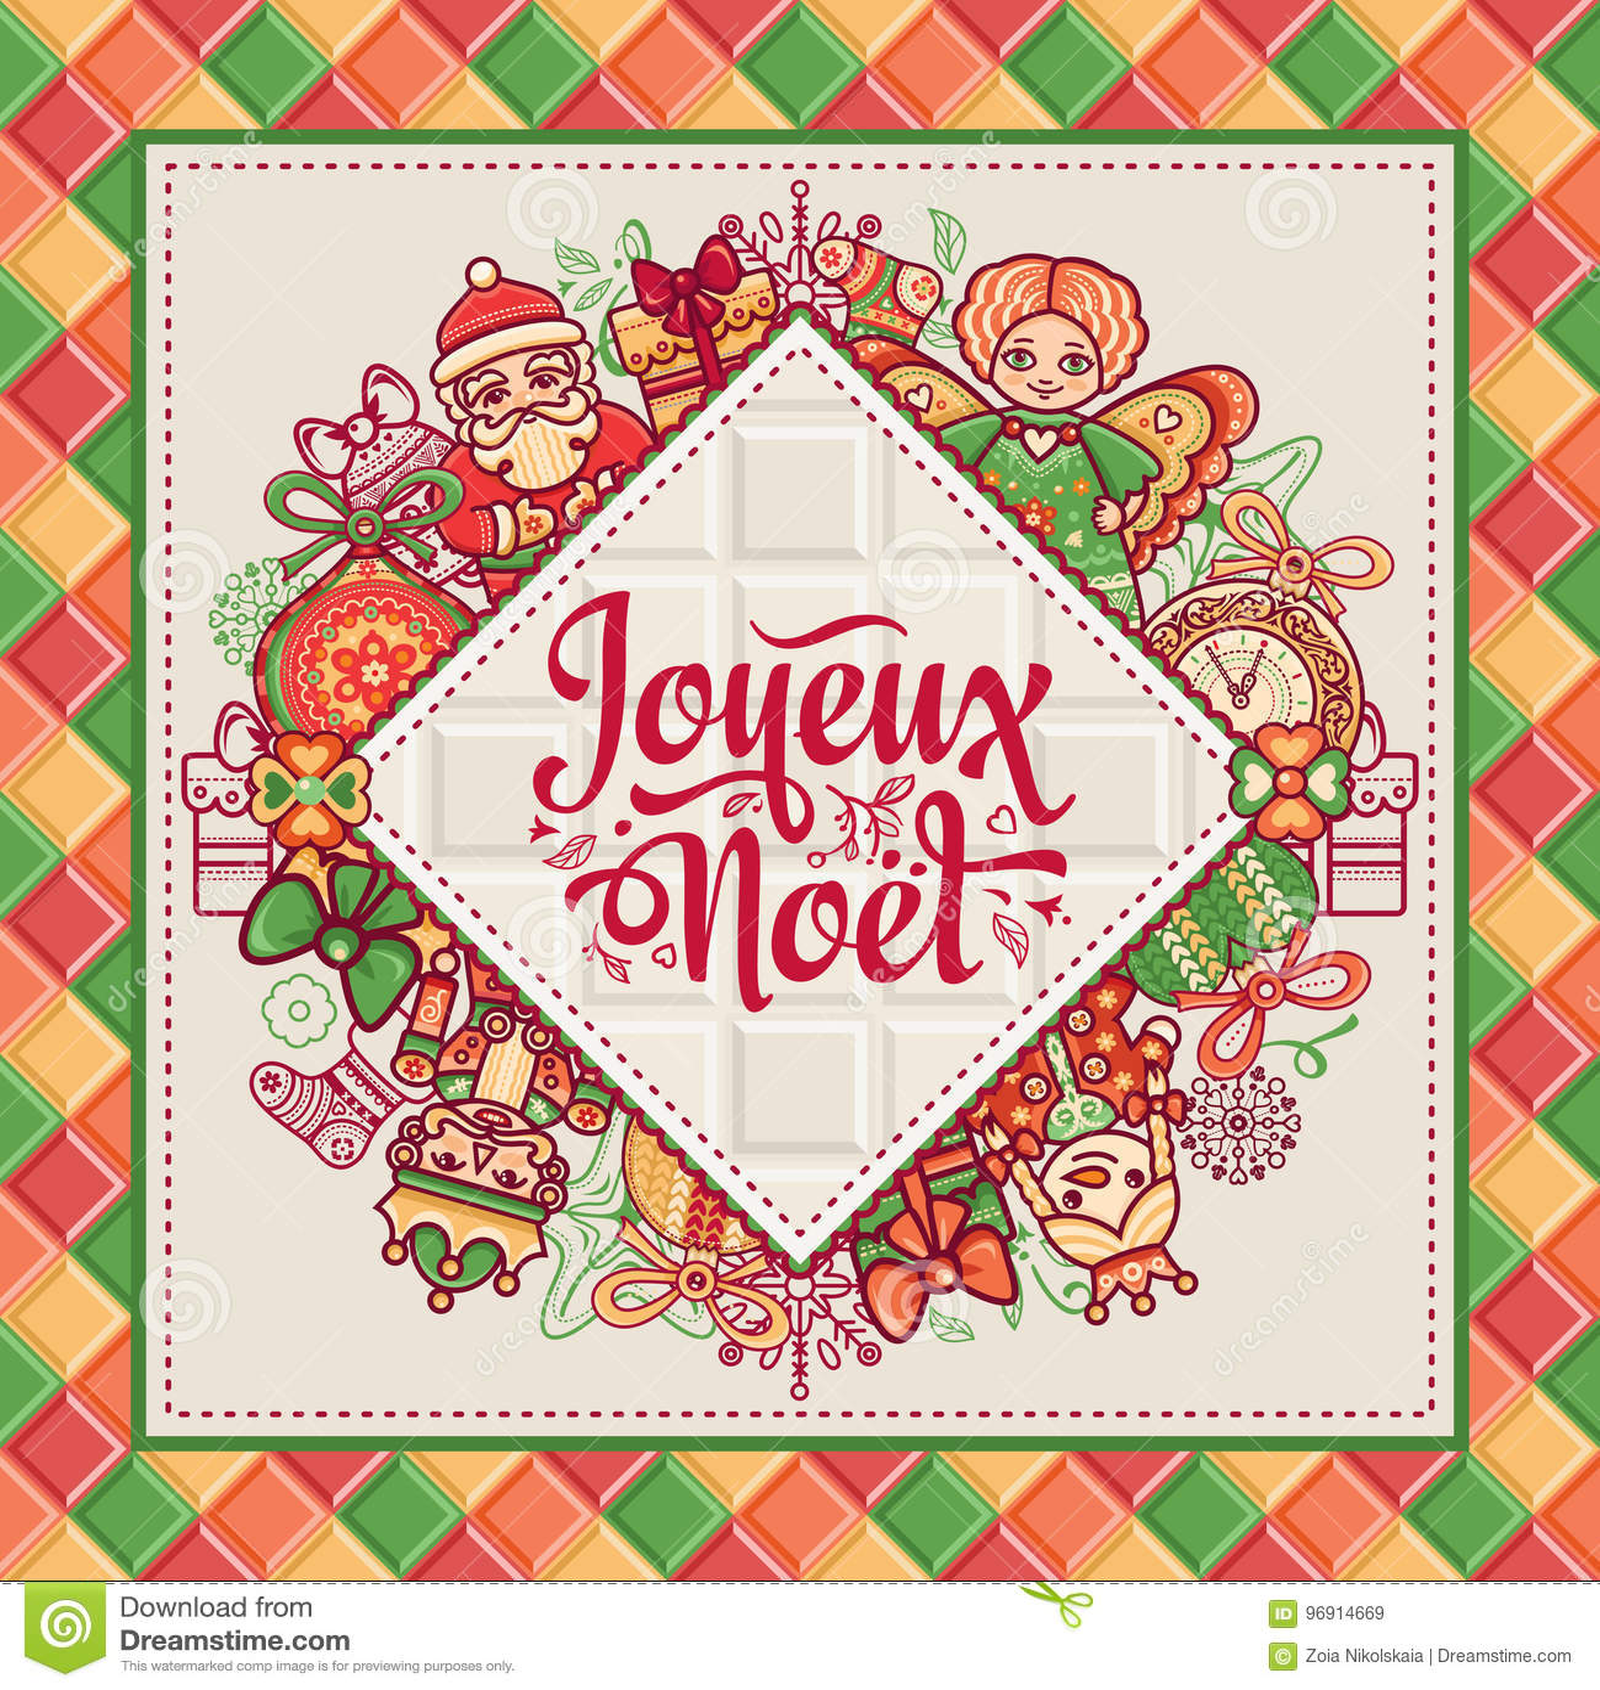 French Merry Christmas Joyeux Noel Christmas Card Stock Vector